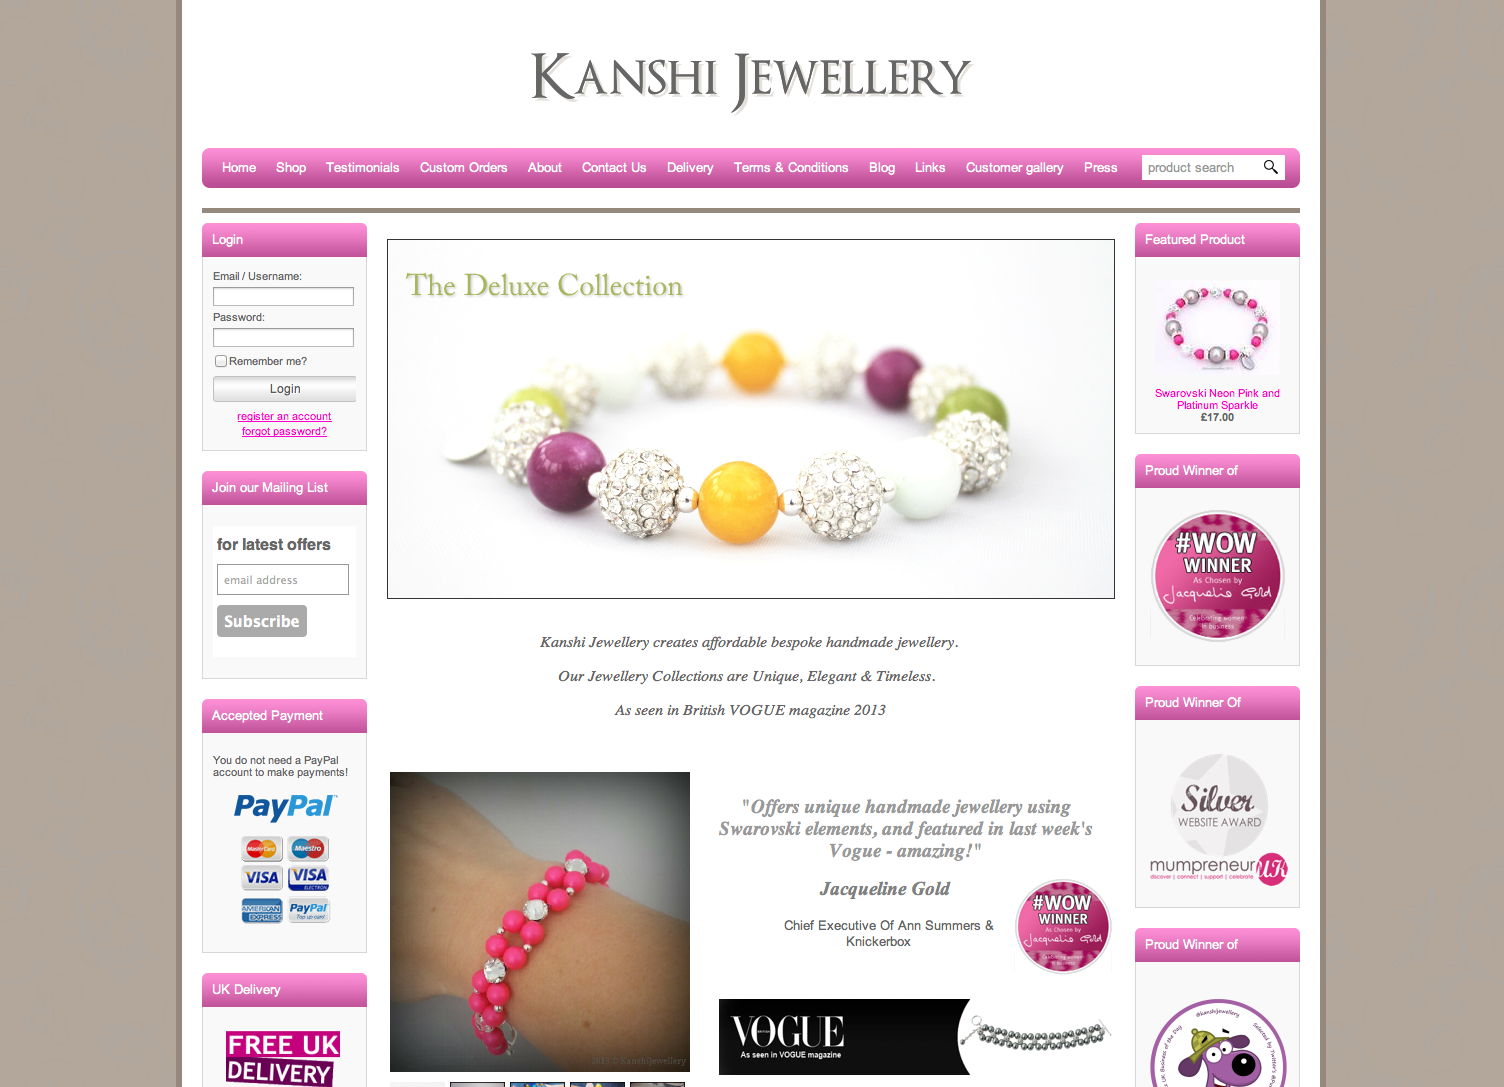 Kanshi Jewellery